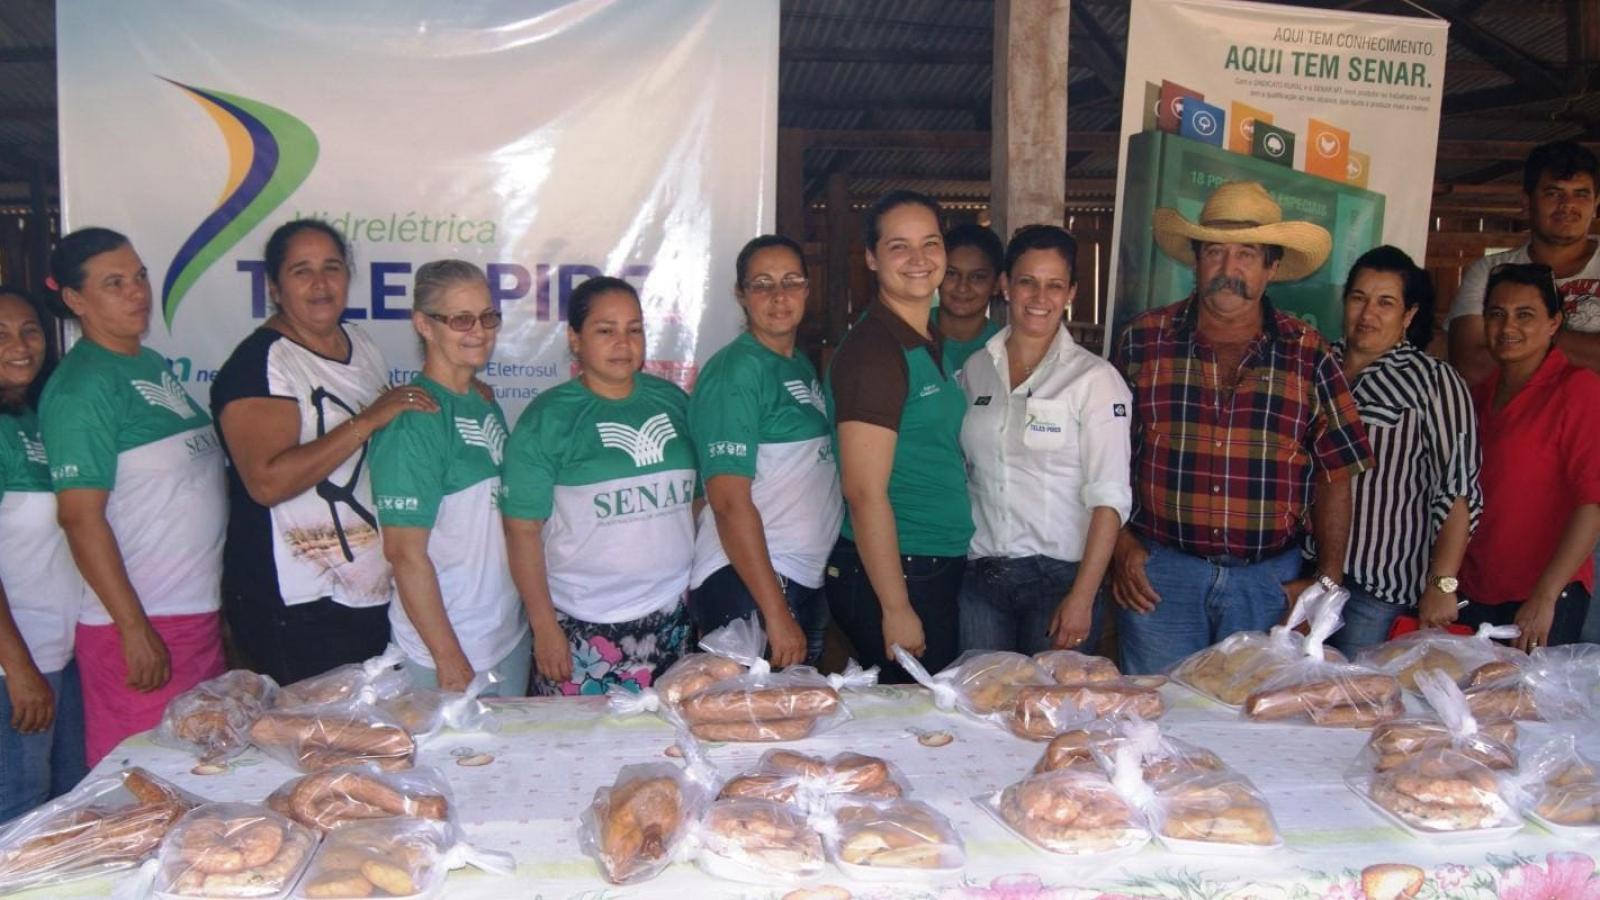 CHTP realiza curso de beneficiamento de frango em comunidade rural